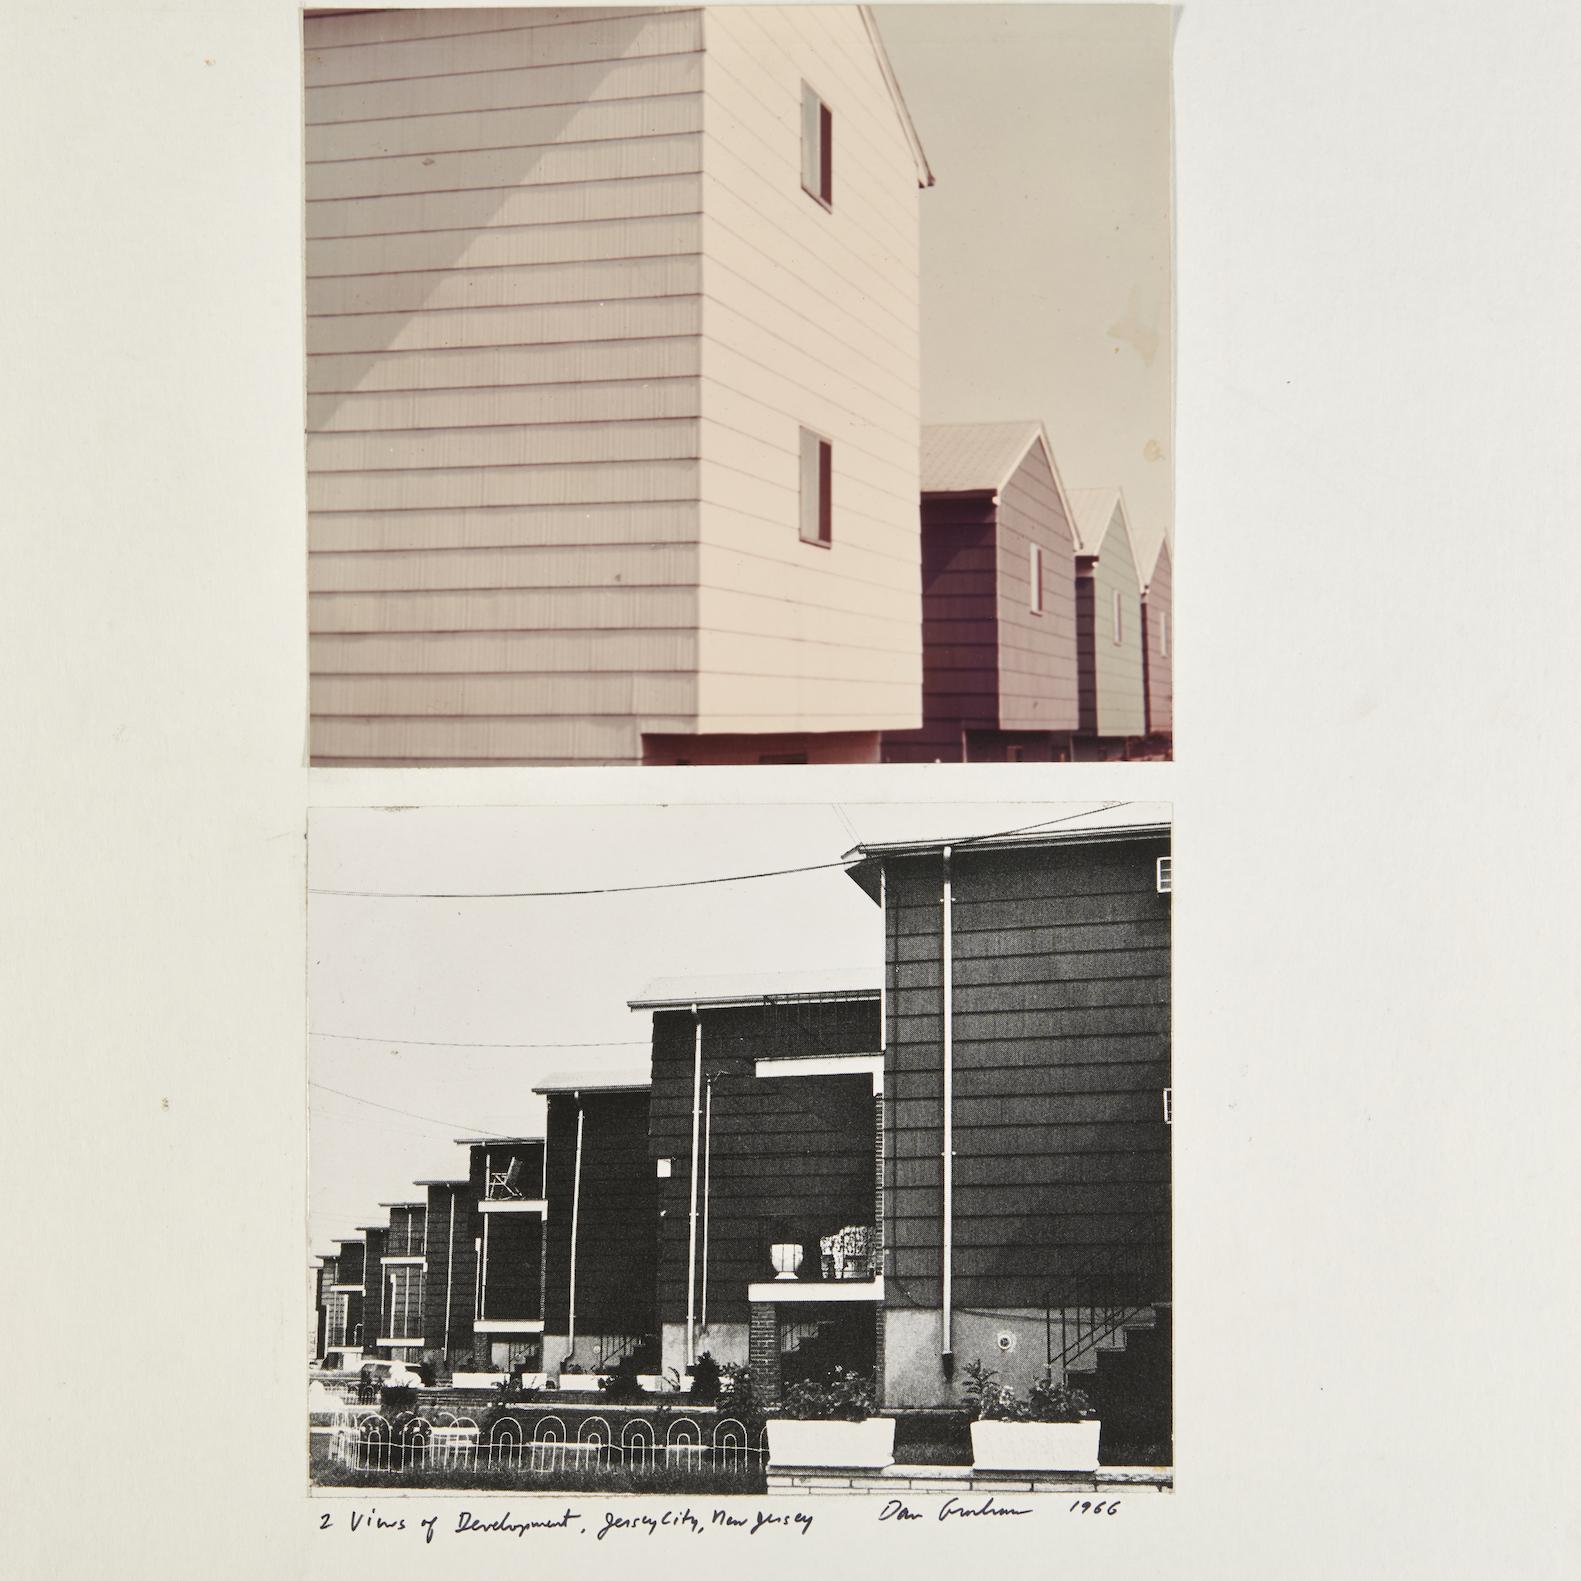 2 Views of Development, Dan Graham. 1966, chromogenic prints mounted on board.